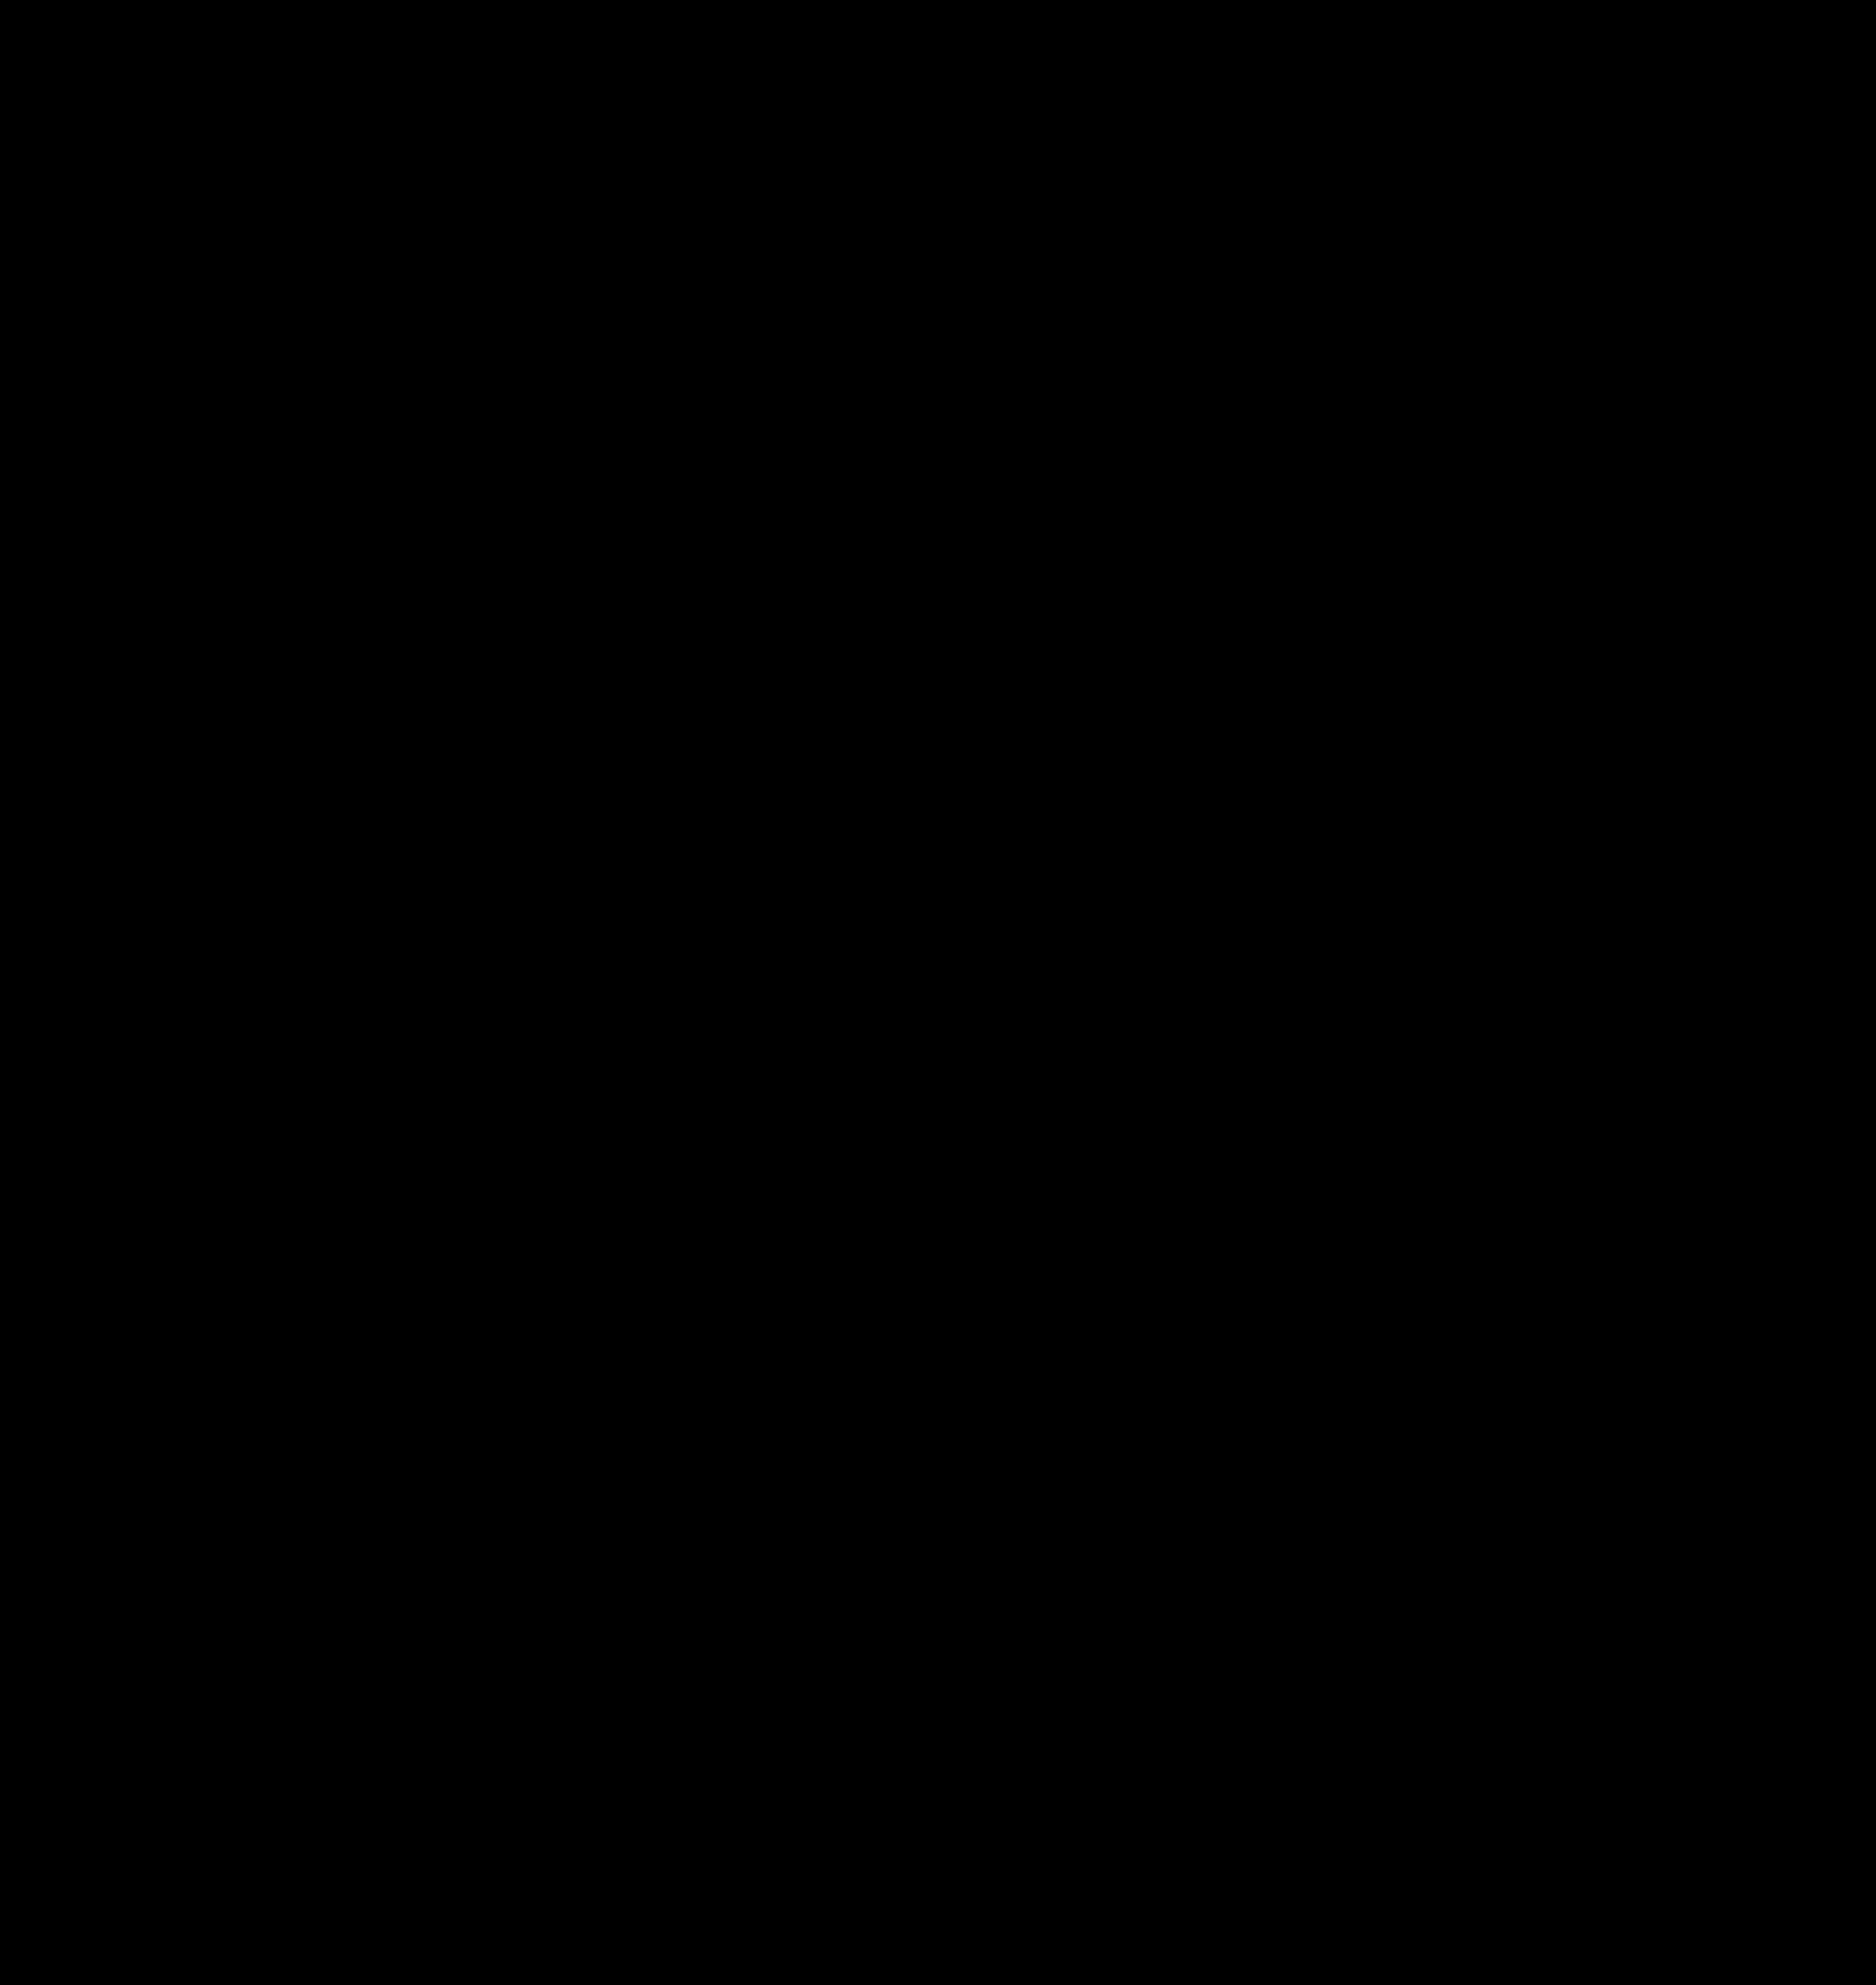 KUCHYŇSKÁ BATERIE SCHOCK LAIOS BRONZE 517000